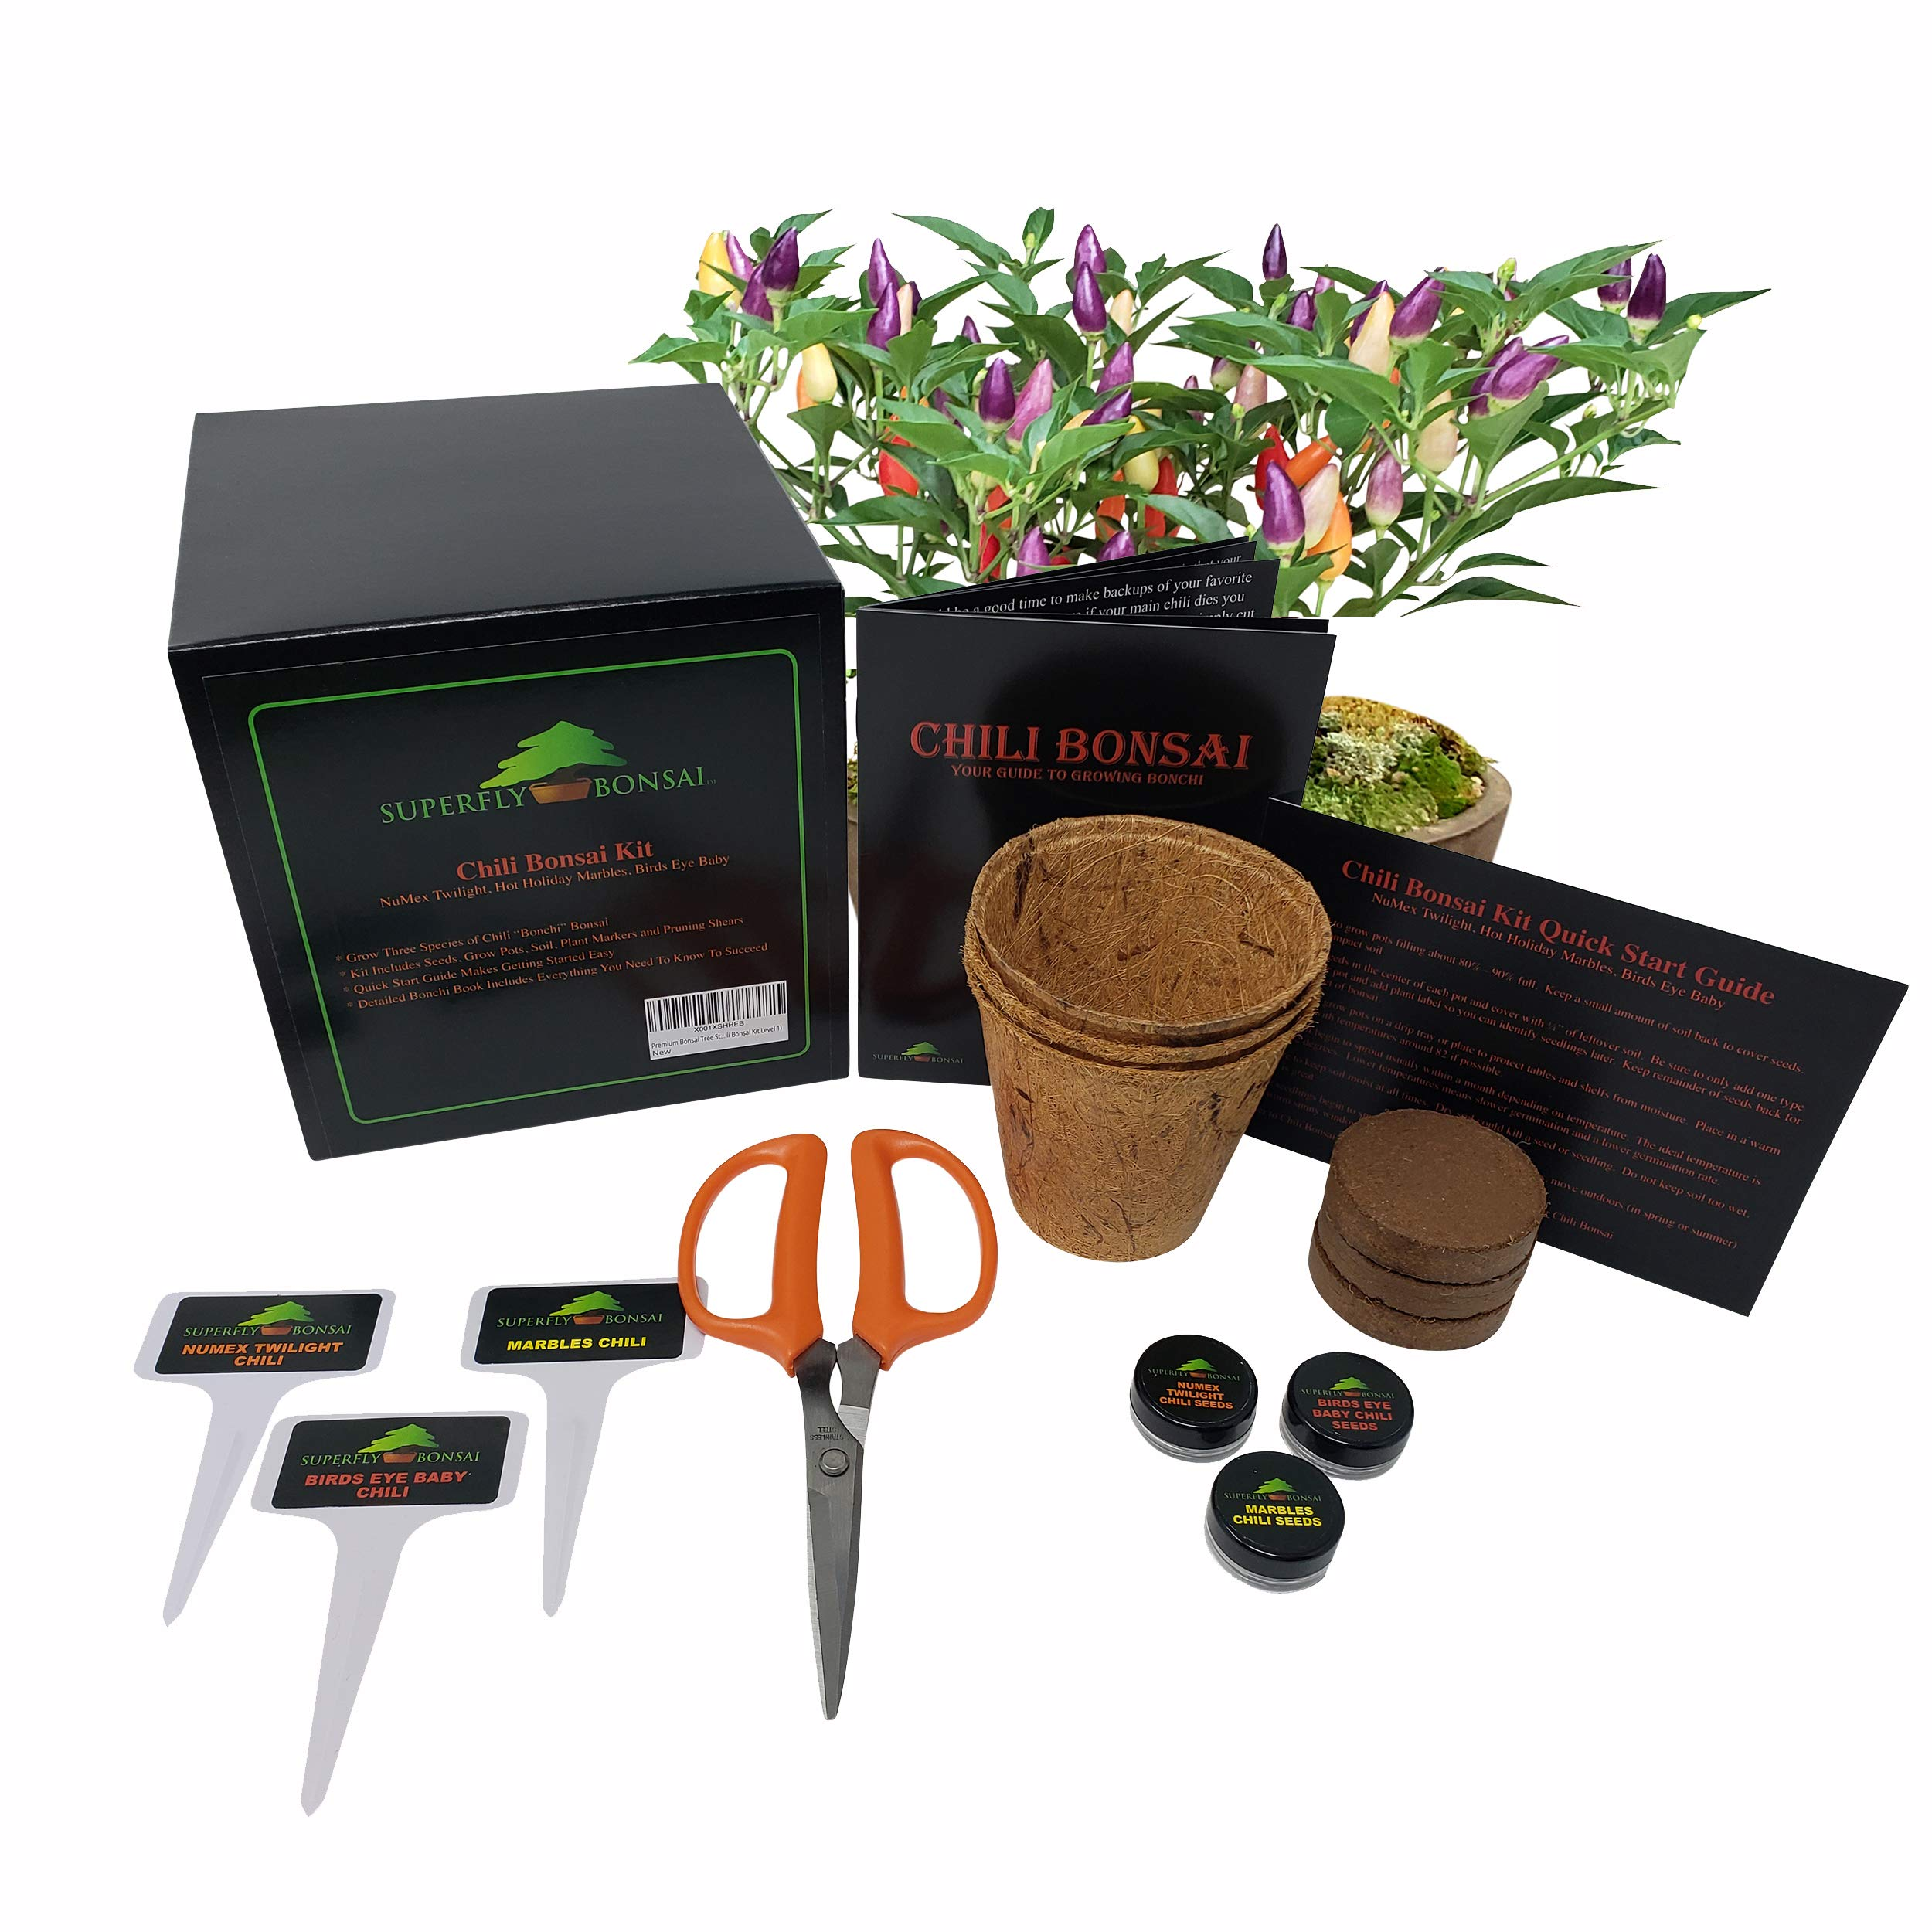 Chili Bonsai Seed Kit - Hot Pepper Bonchi Tree Starter Kit (Chili Bonsai Kit Level 1) by Superfly Bonsai (Image #1)